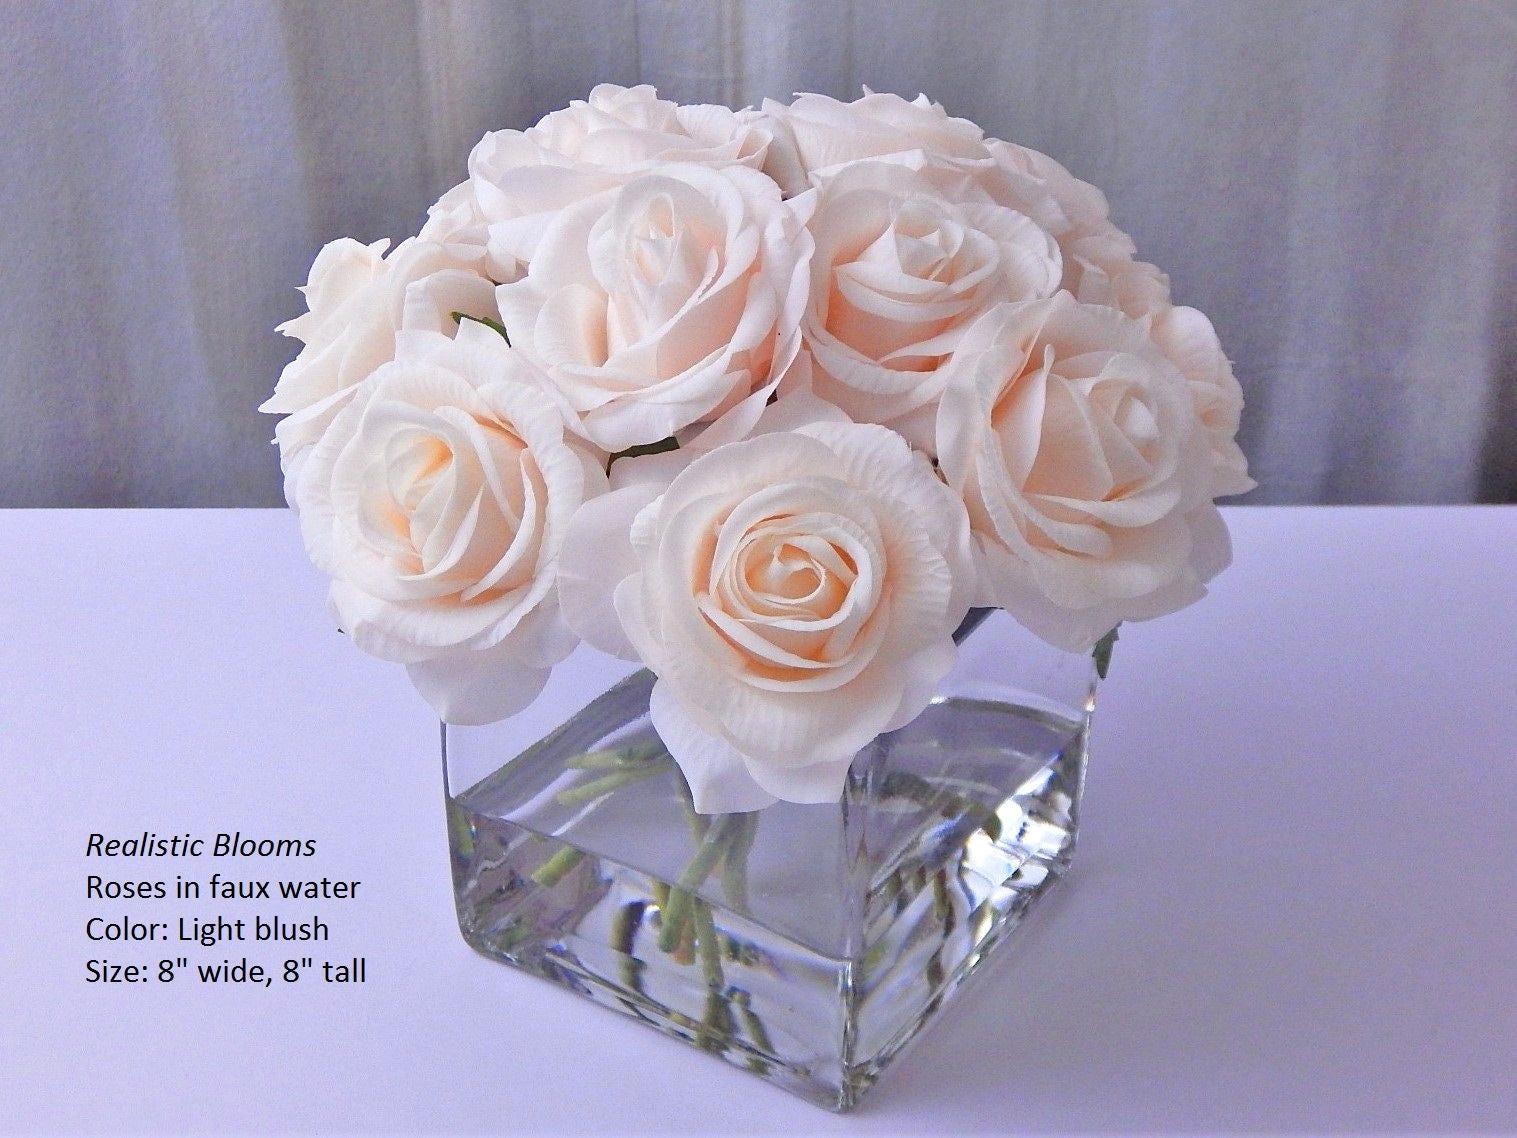 Pinkblushlight silk roseroses cubevase faux water